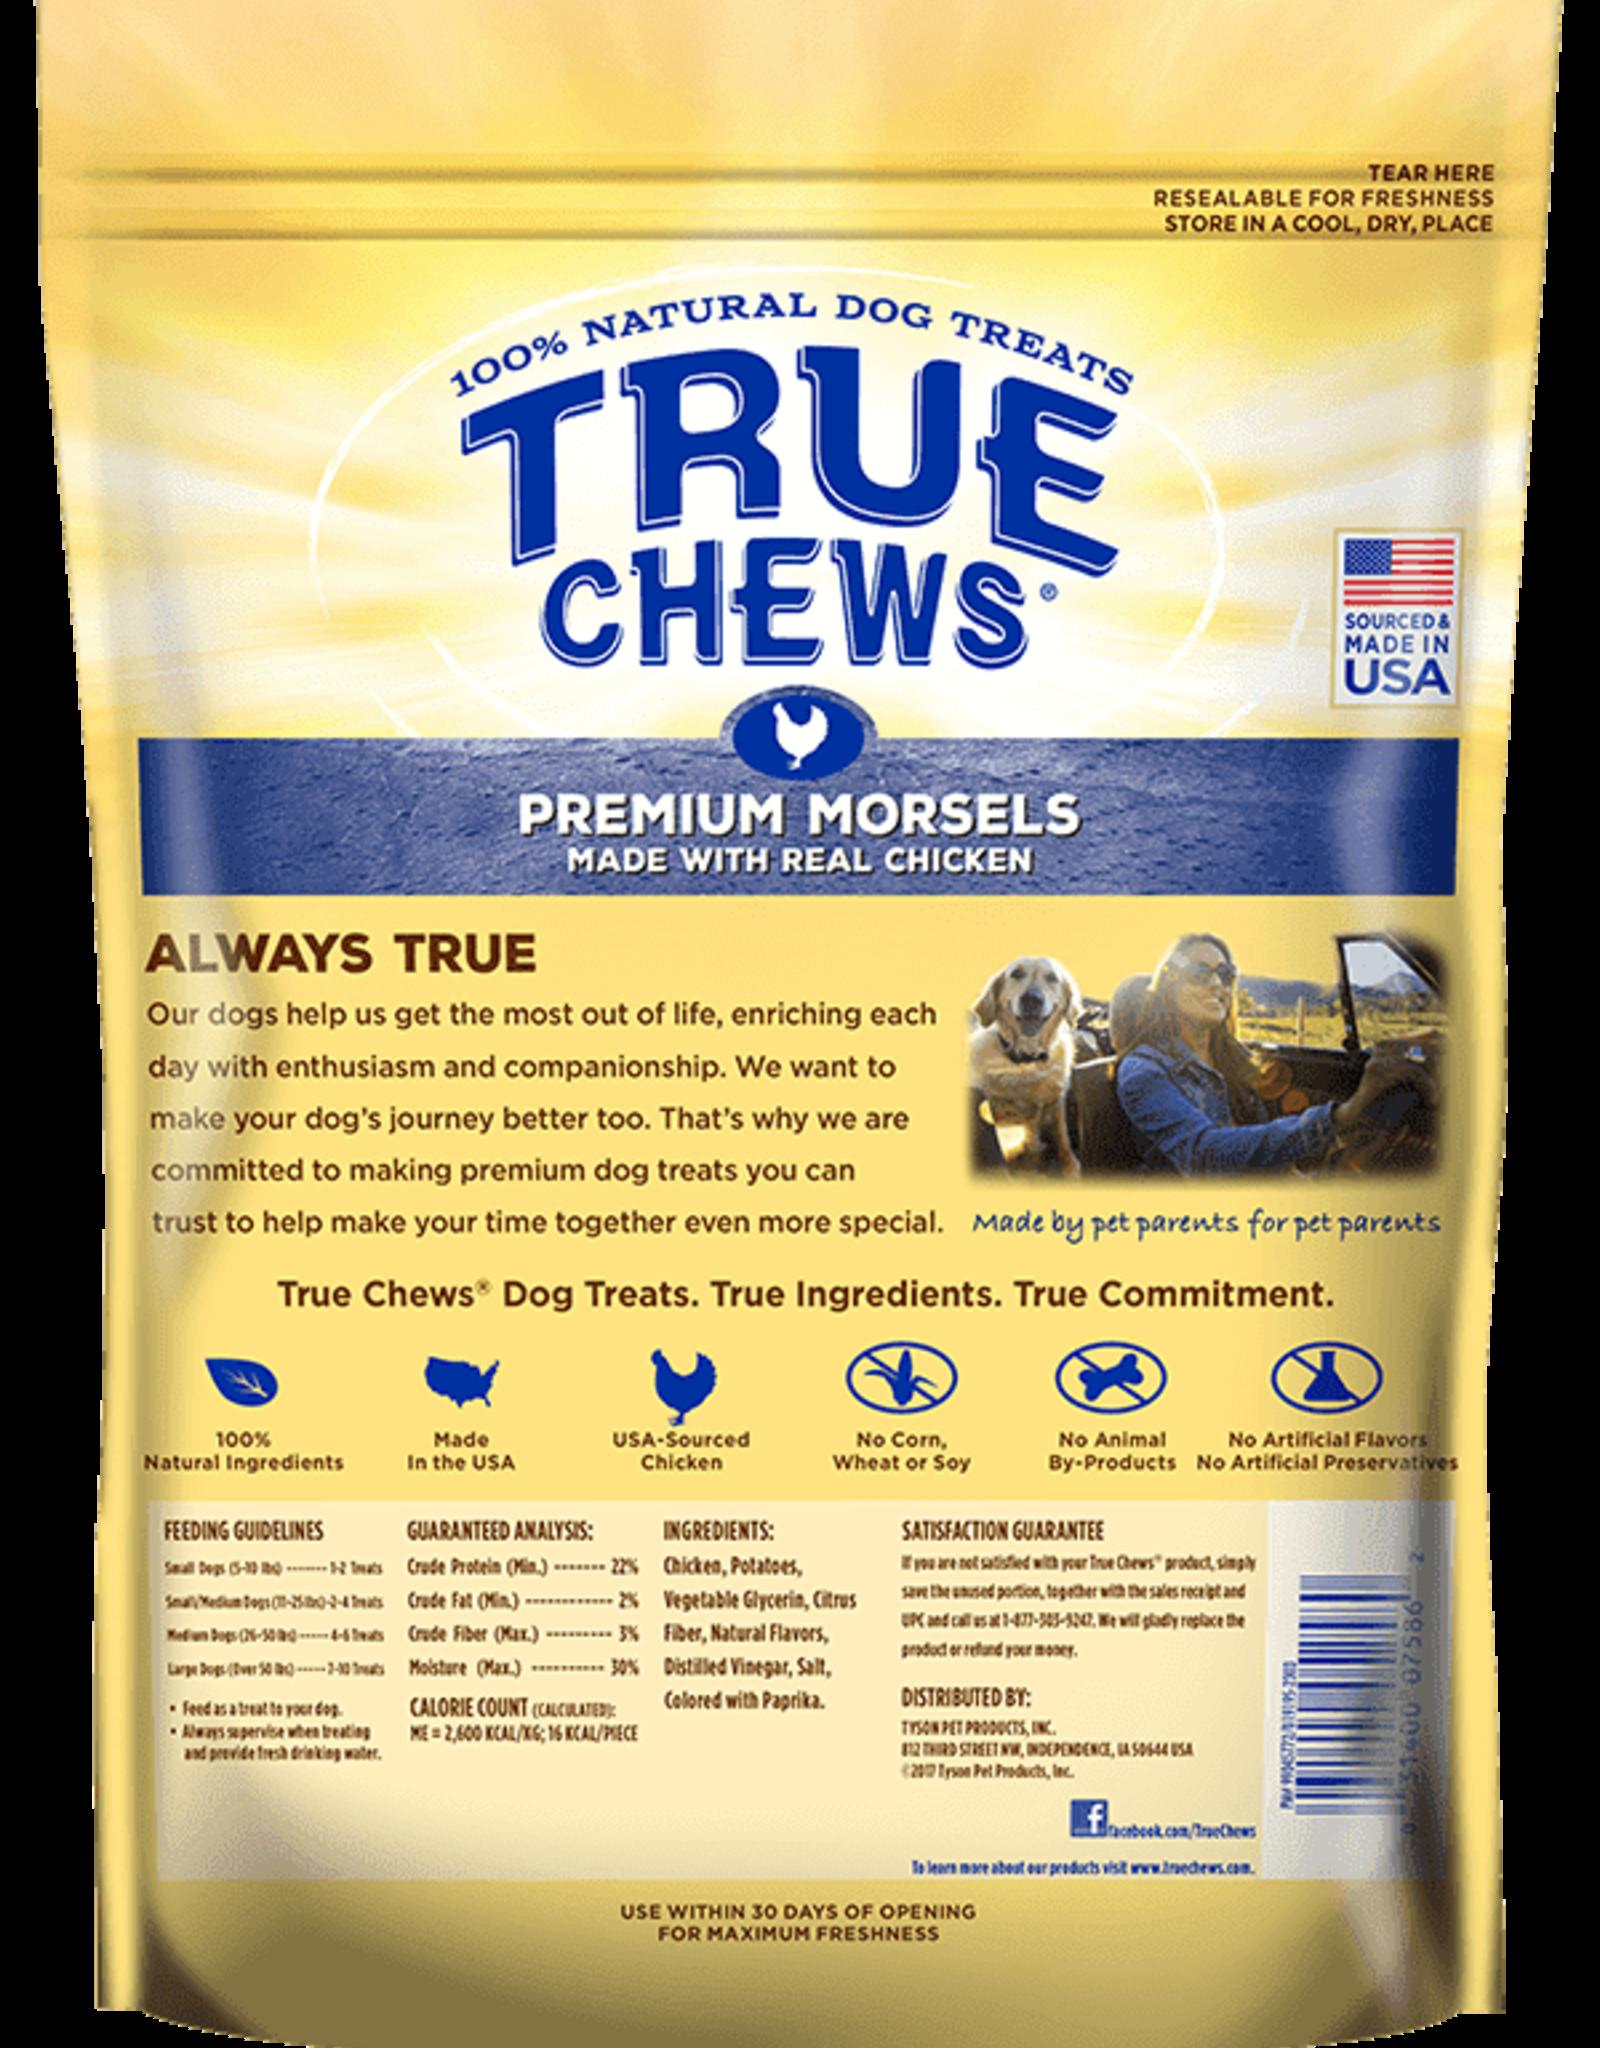 TYSON PET PRODUCTS INC TRUE CHEWS PREMIUM MORSELS CHICKEN 10OZ